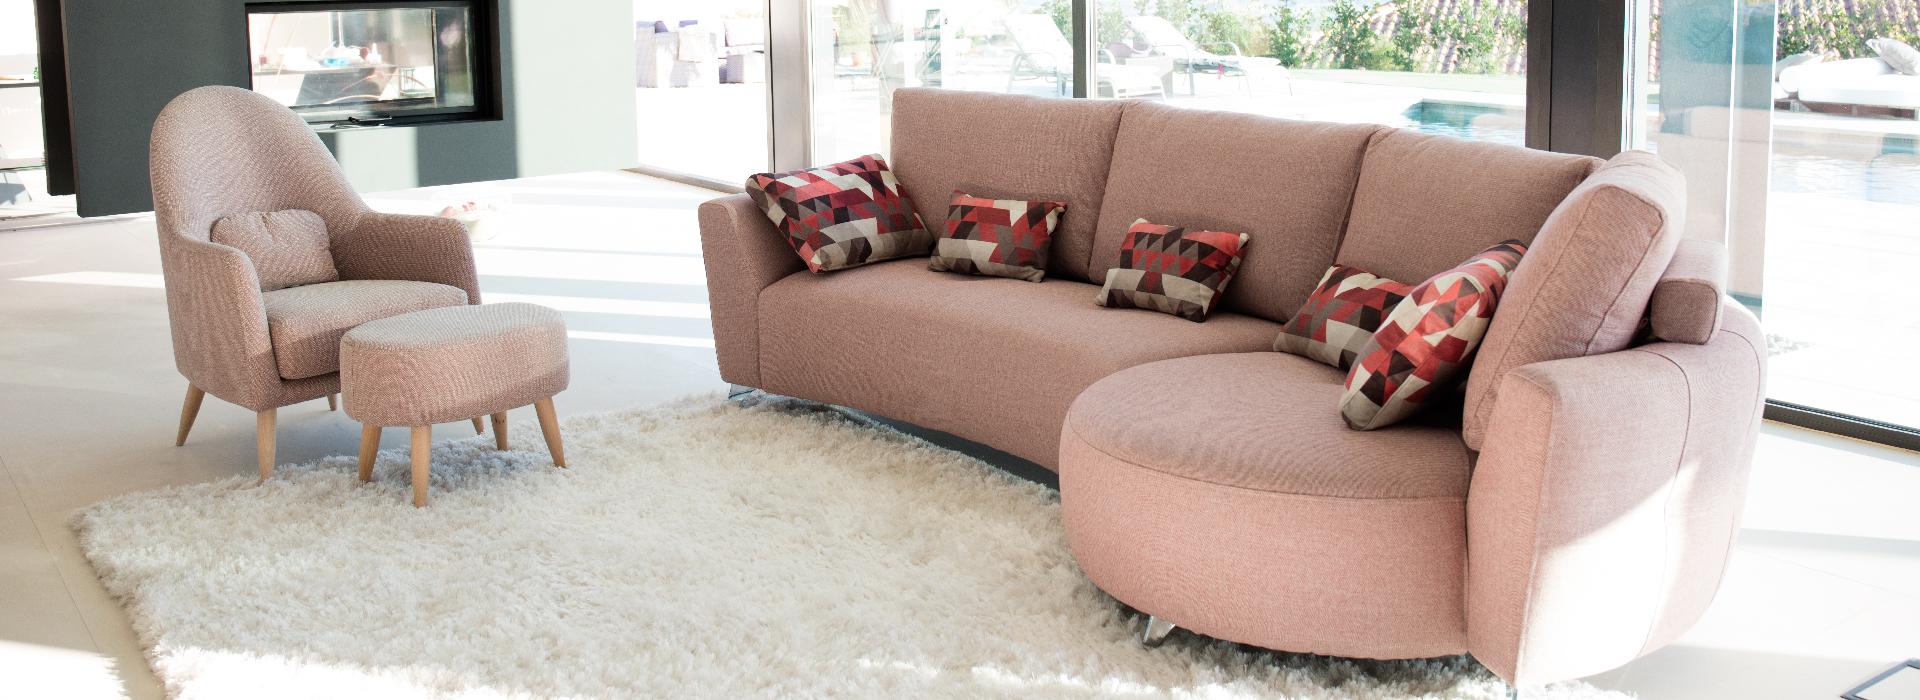 sofás de tela